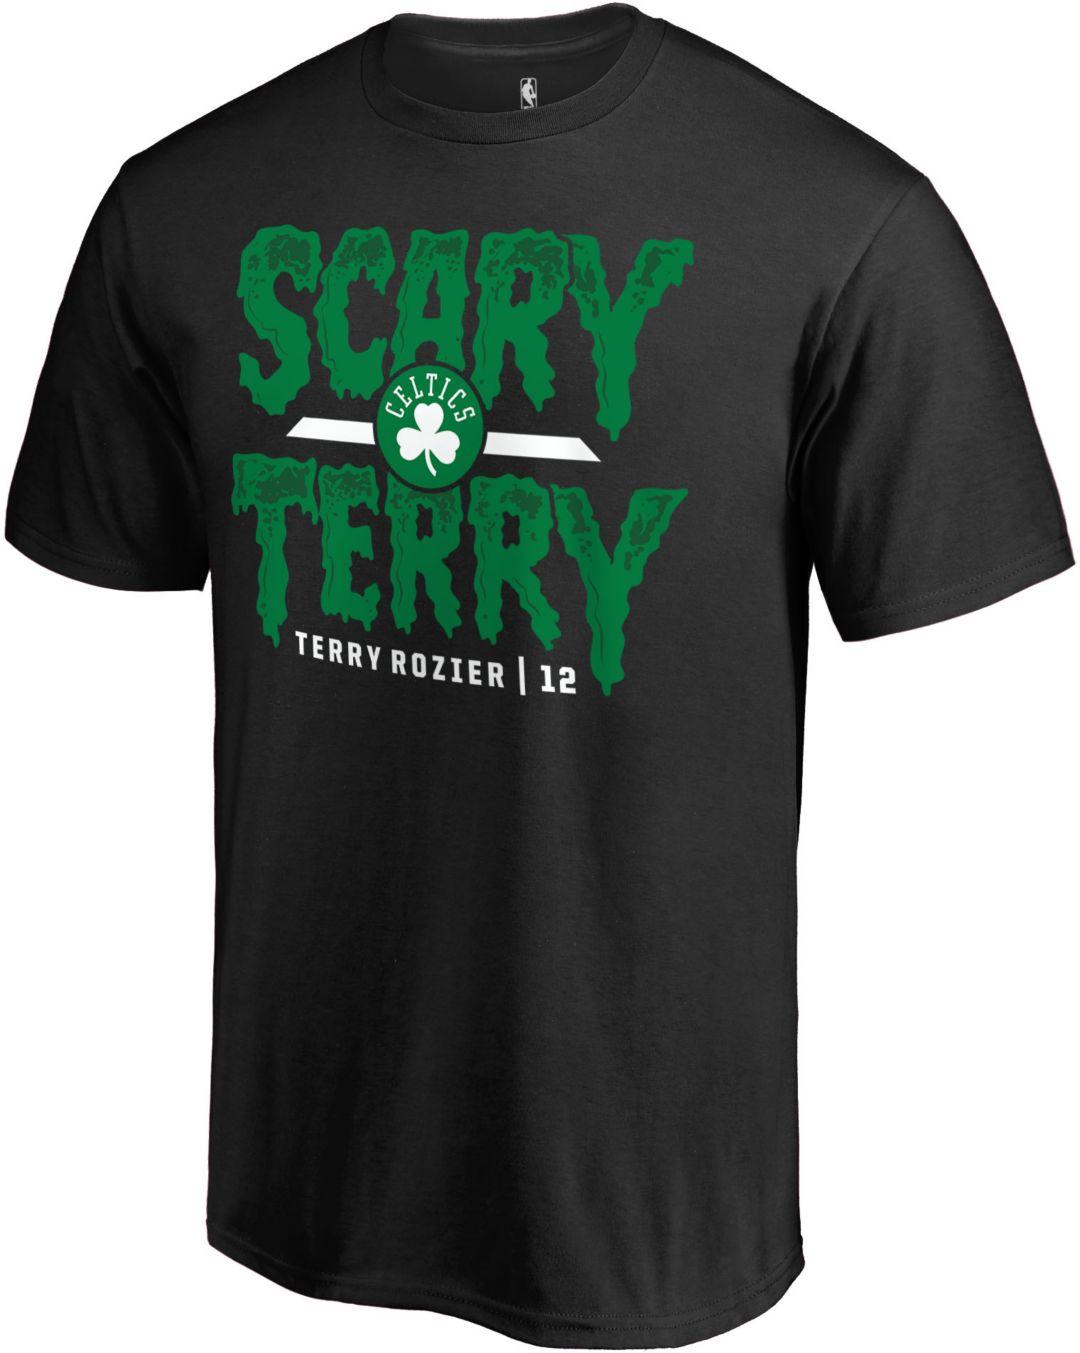 "cc6bbf41b98 NBA Men's Boston Celtics Terry Rozier ""Scary Terry"" Black T-Shirt ..."